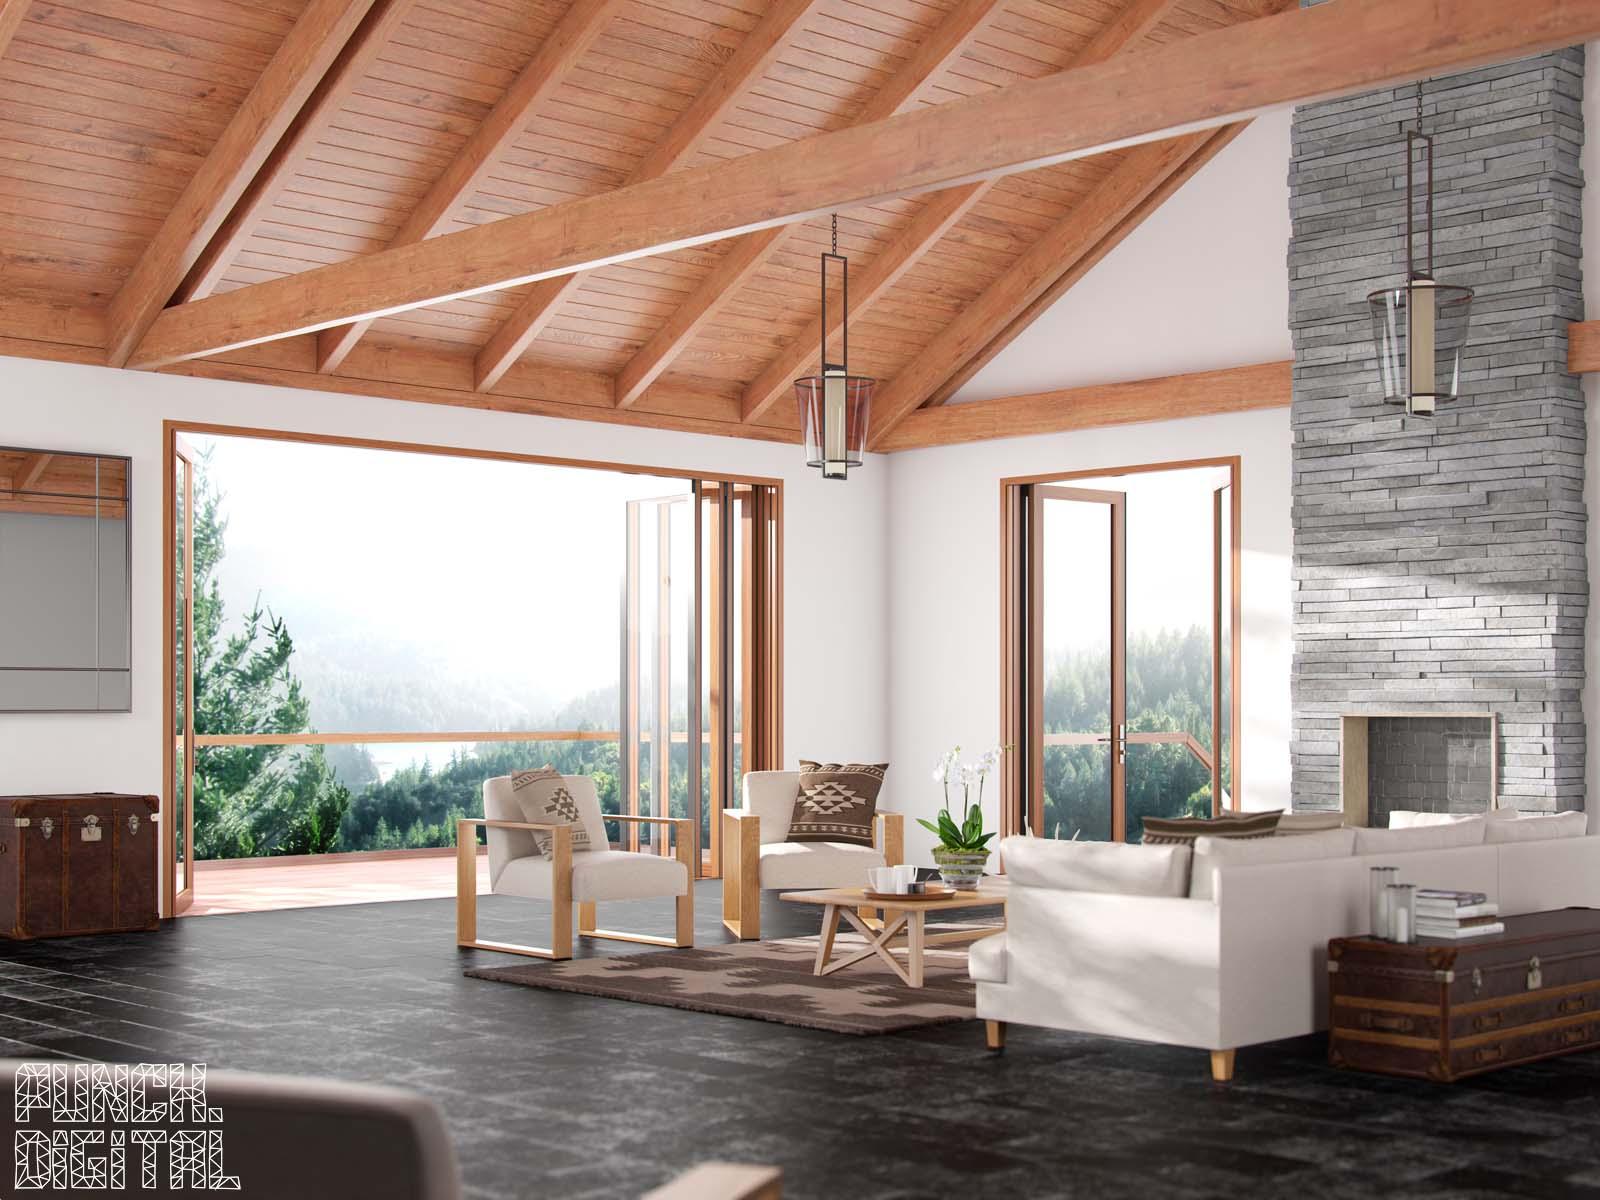 Centor Doors Interior Product CGI Visualisation